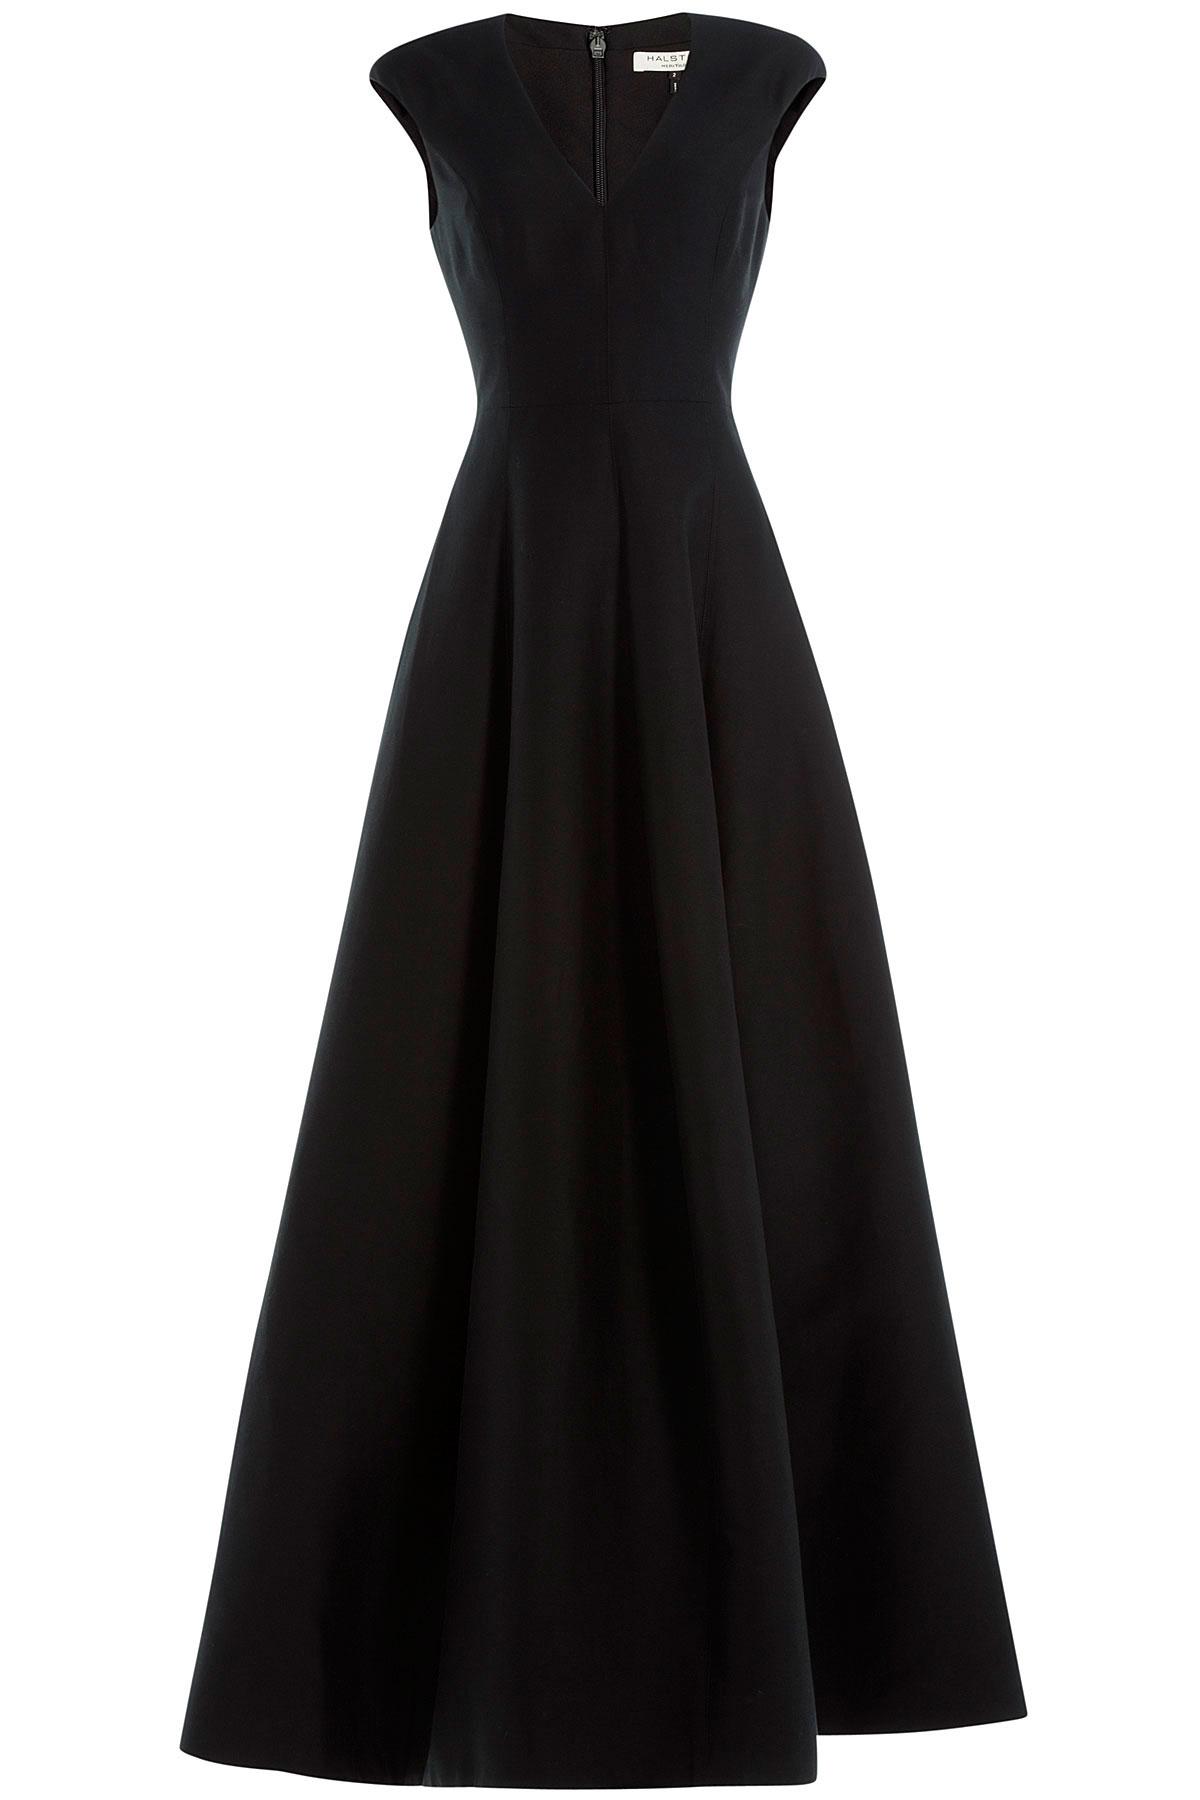 Lyst - Halston Floor Length Evening Gown With Silk - Black in Black